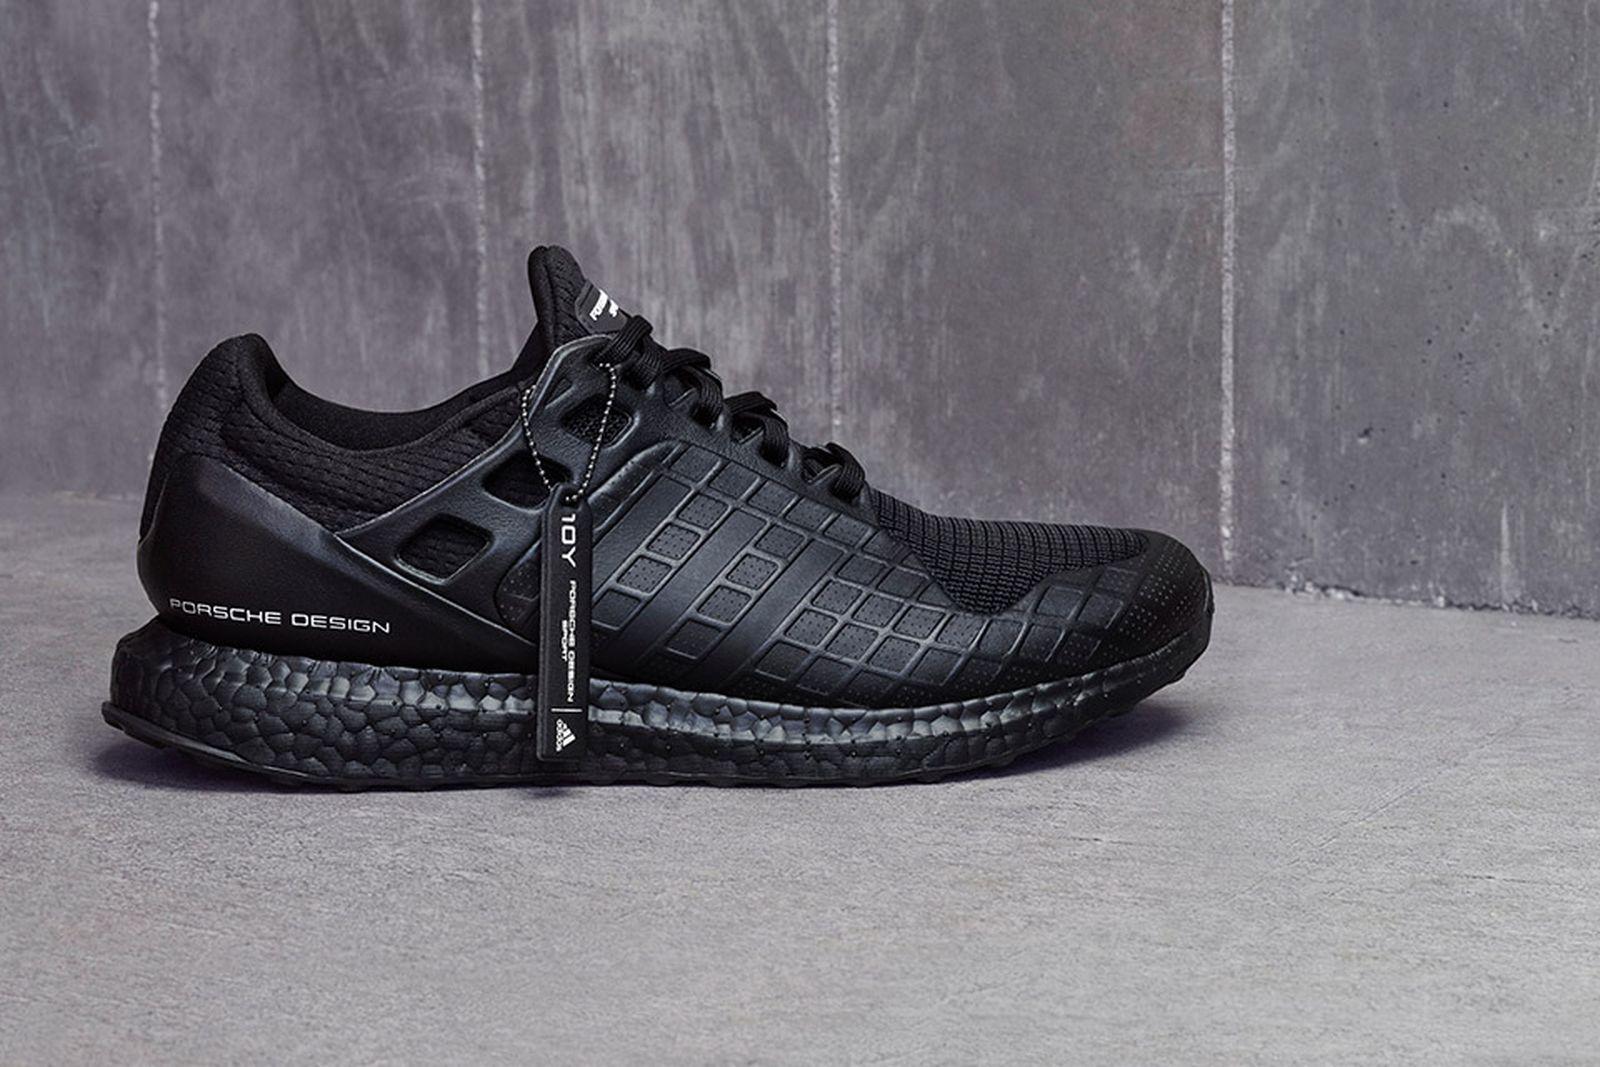 porsche-design-sport-adidas-ultra-boost-black-07